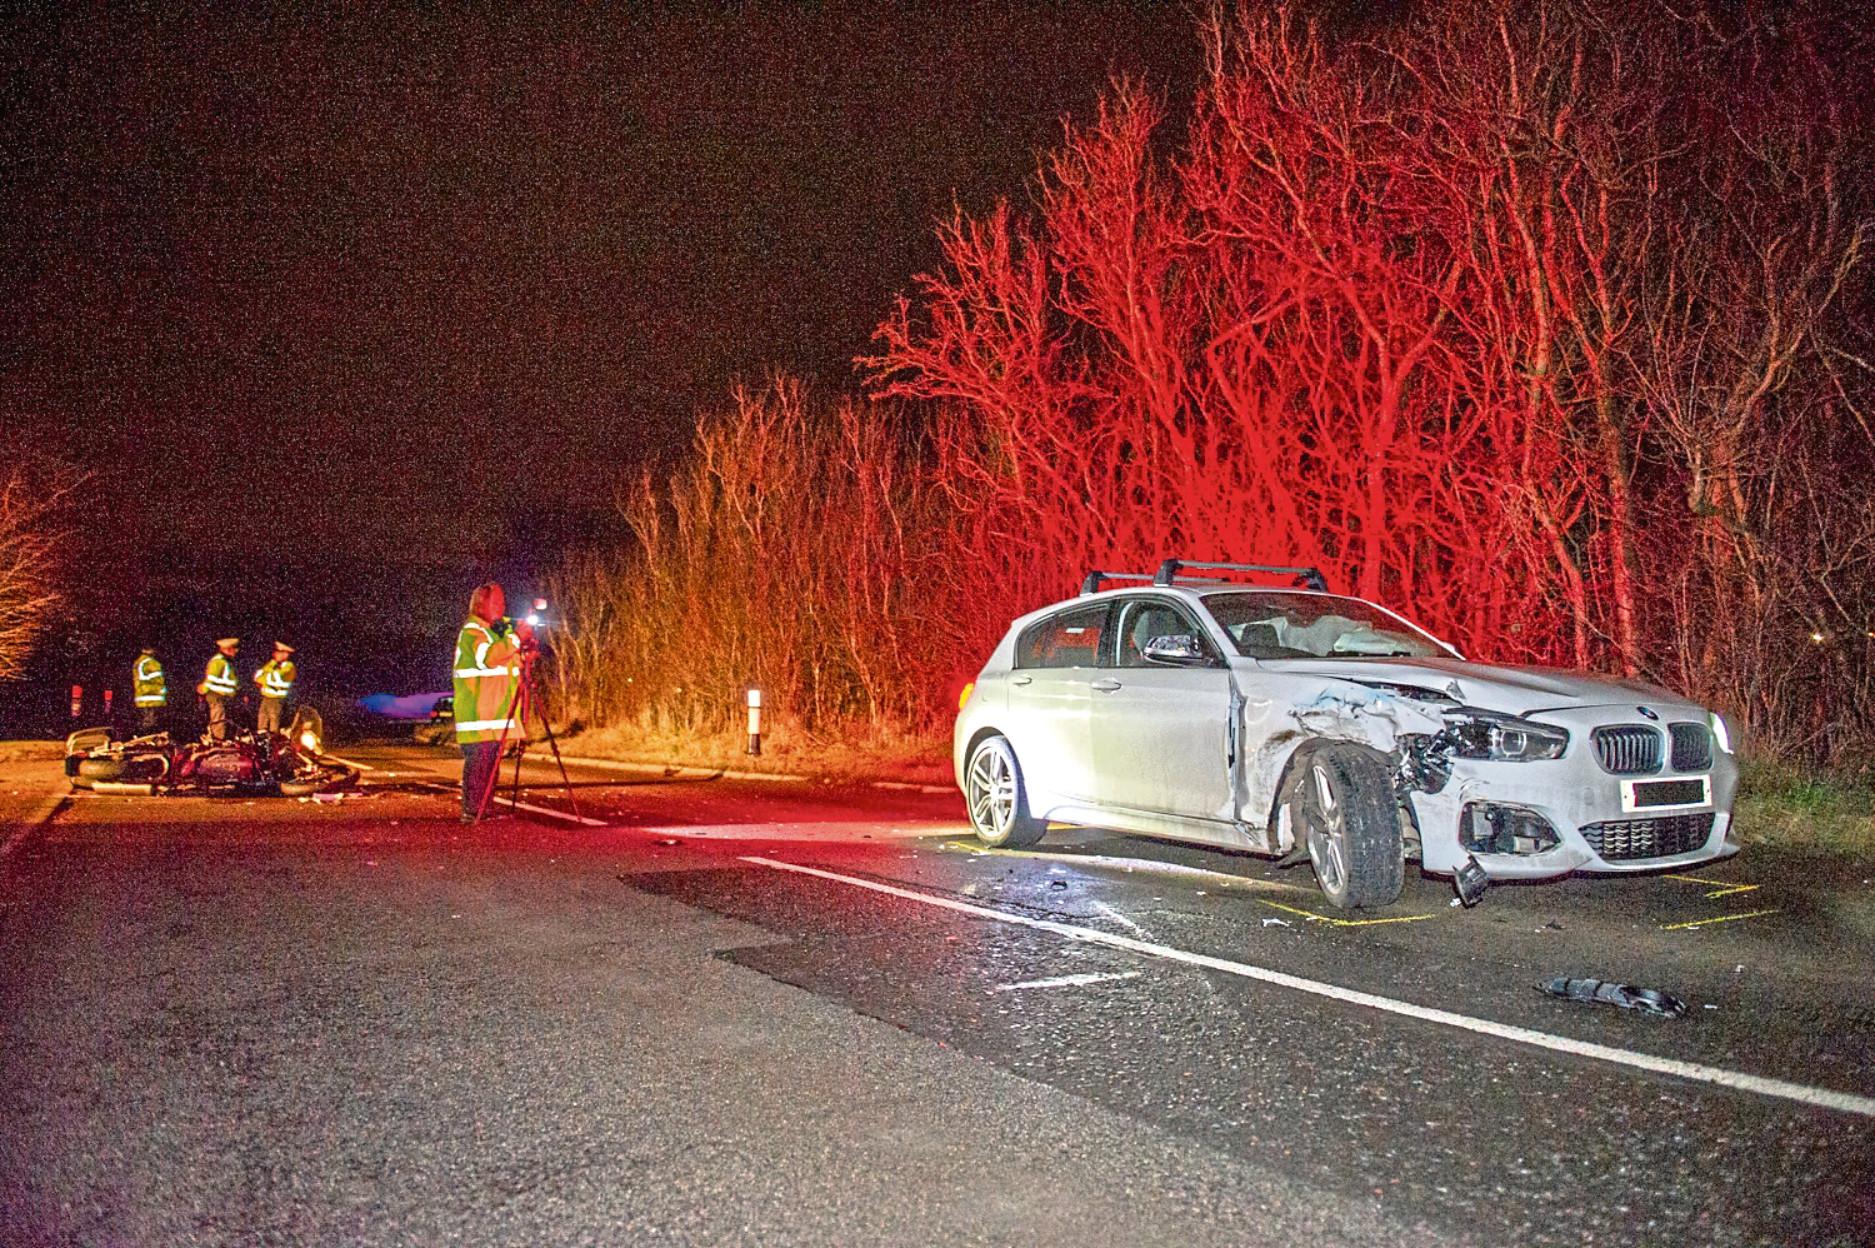 Scene of the crash in Auchterhouse on the B954